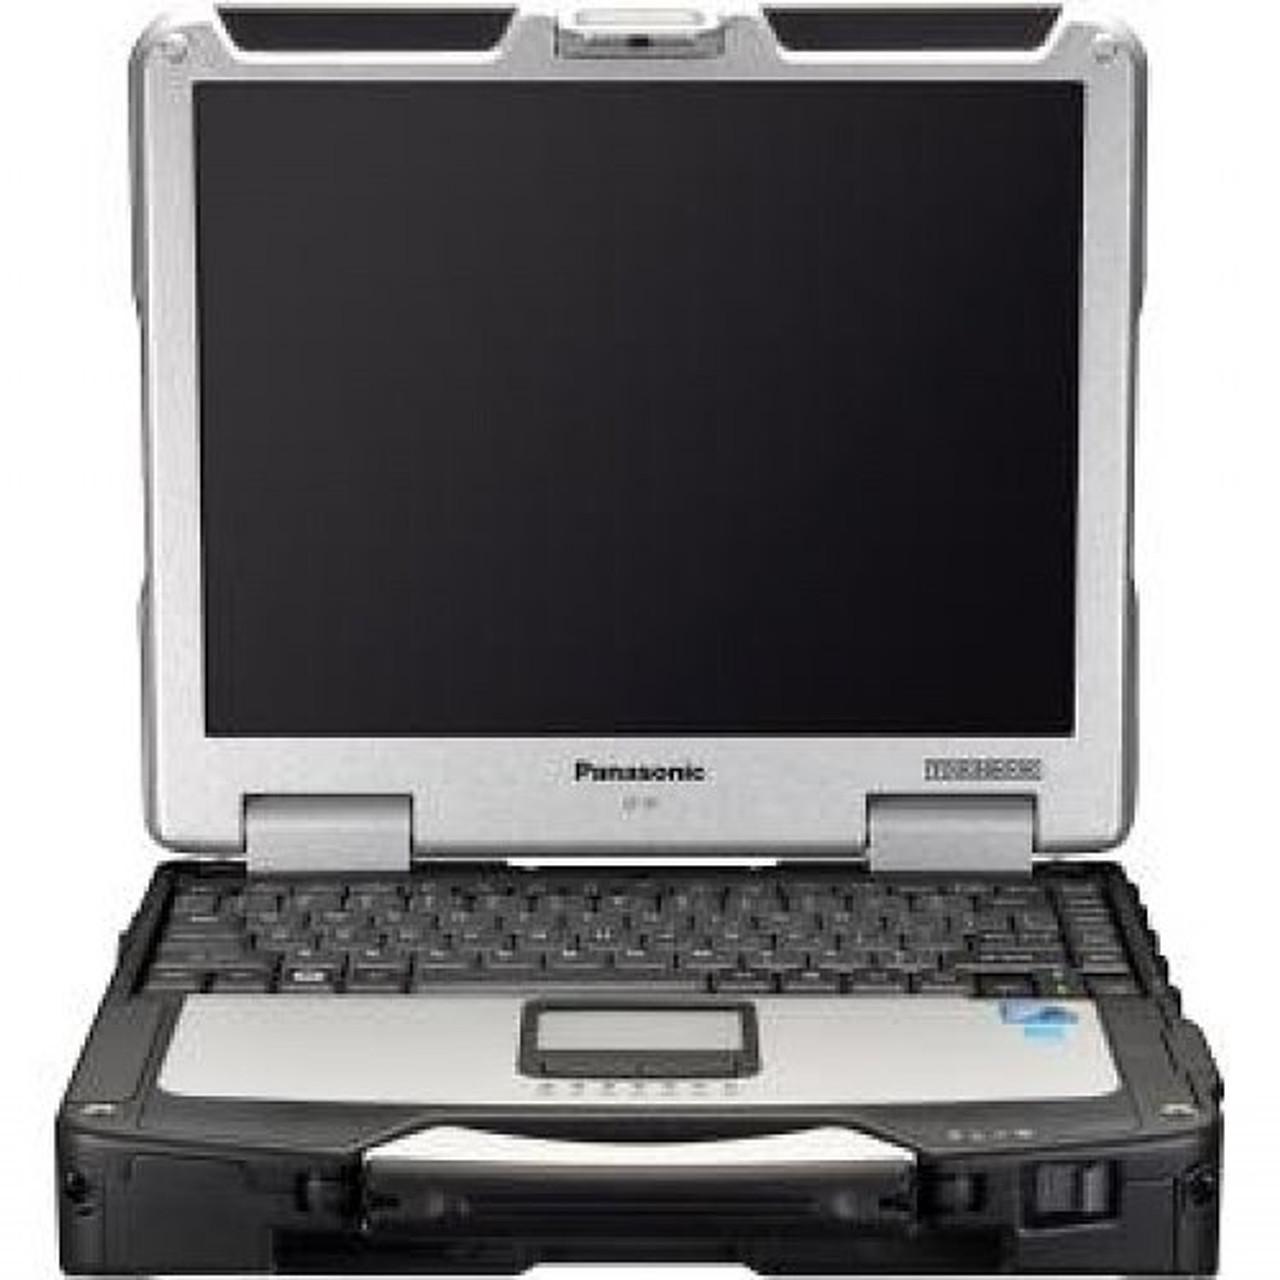 Panasonic Toughbook CF-31